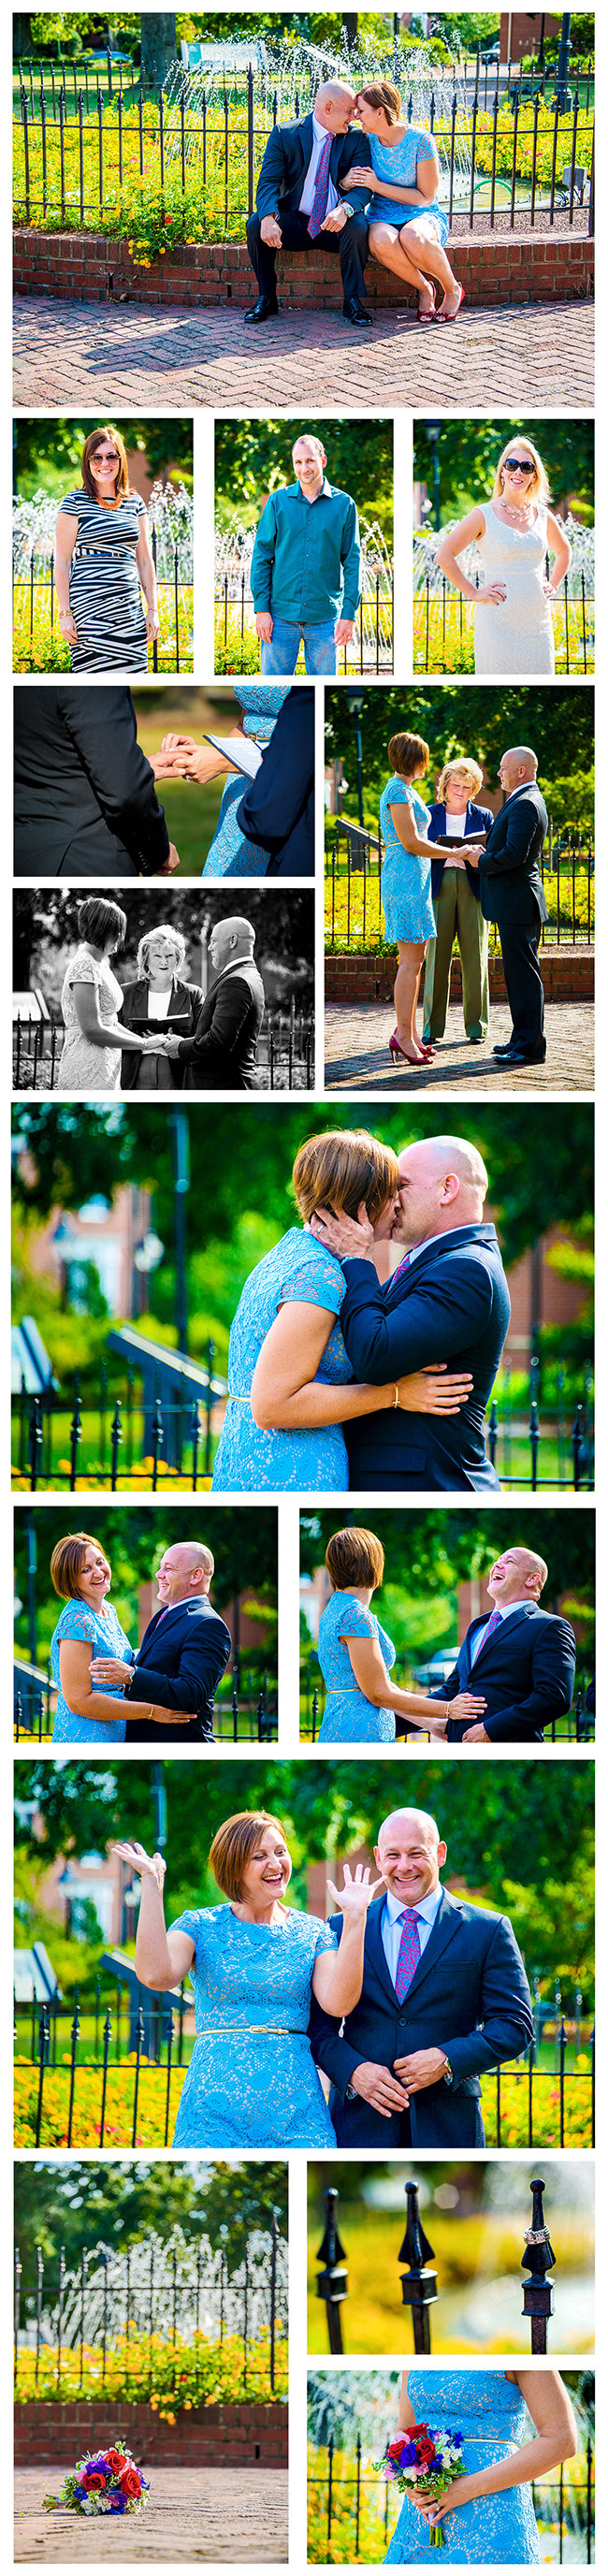 Fredericksburg elopement